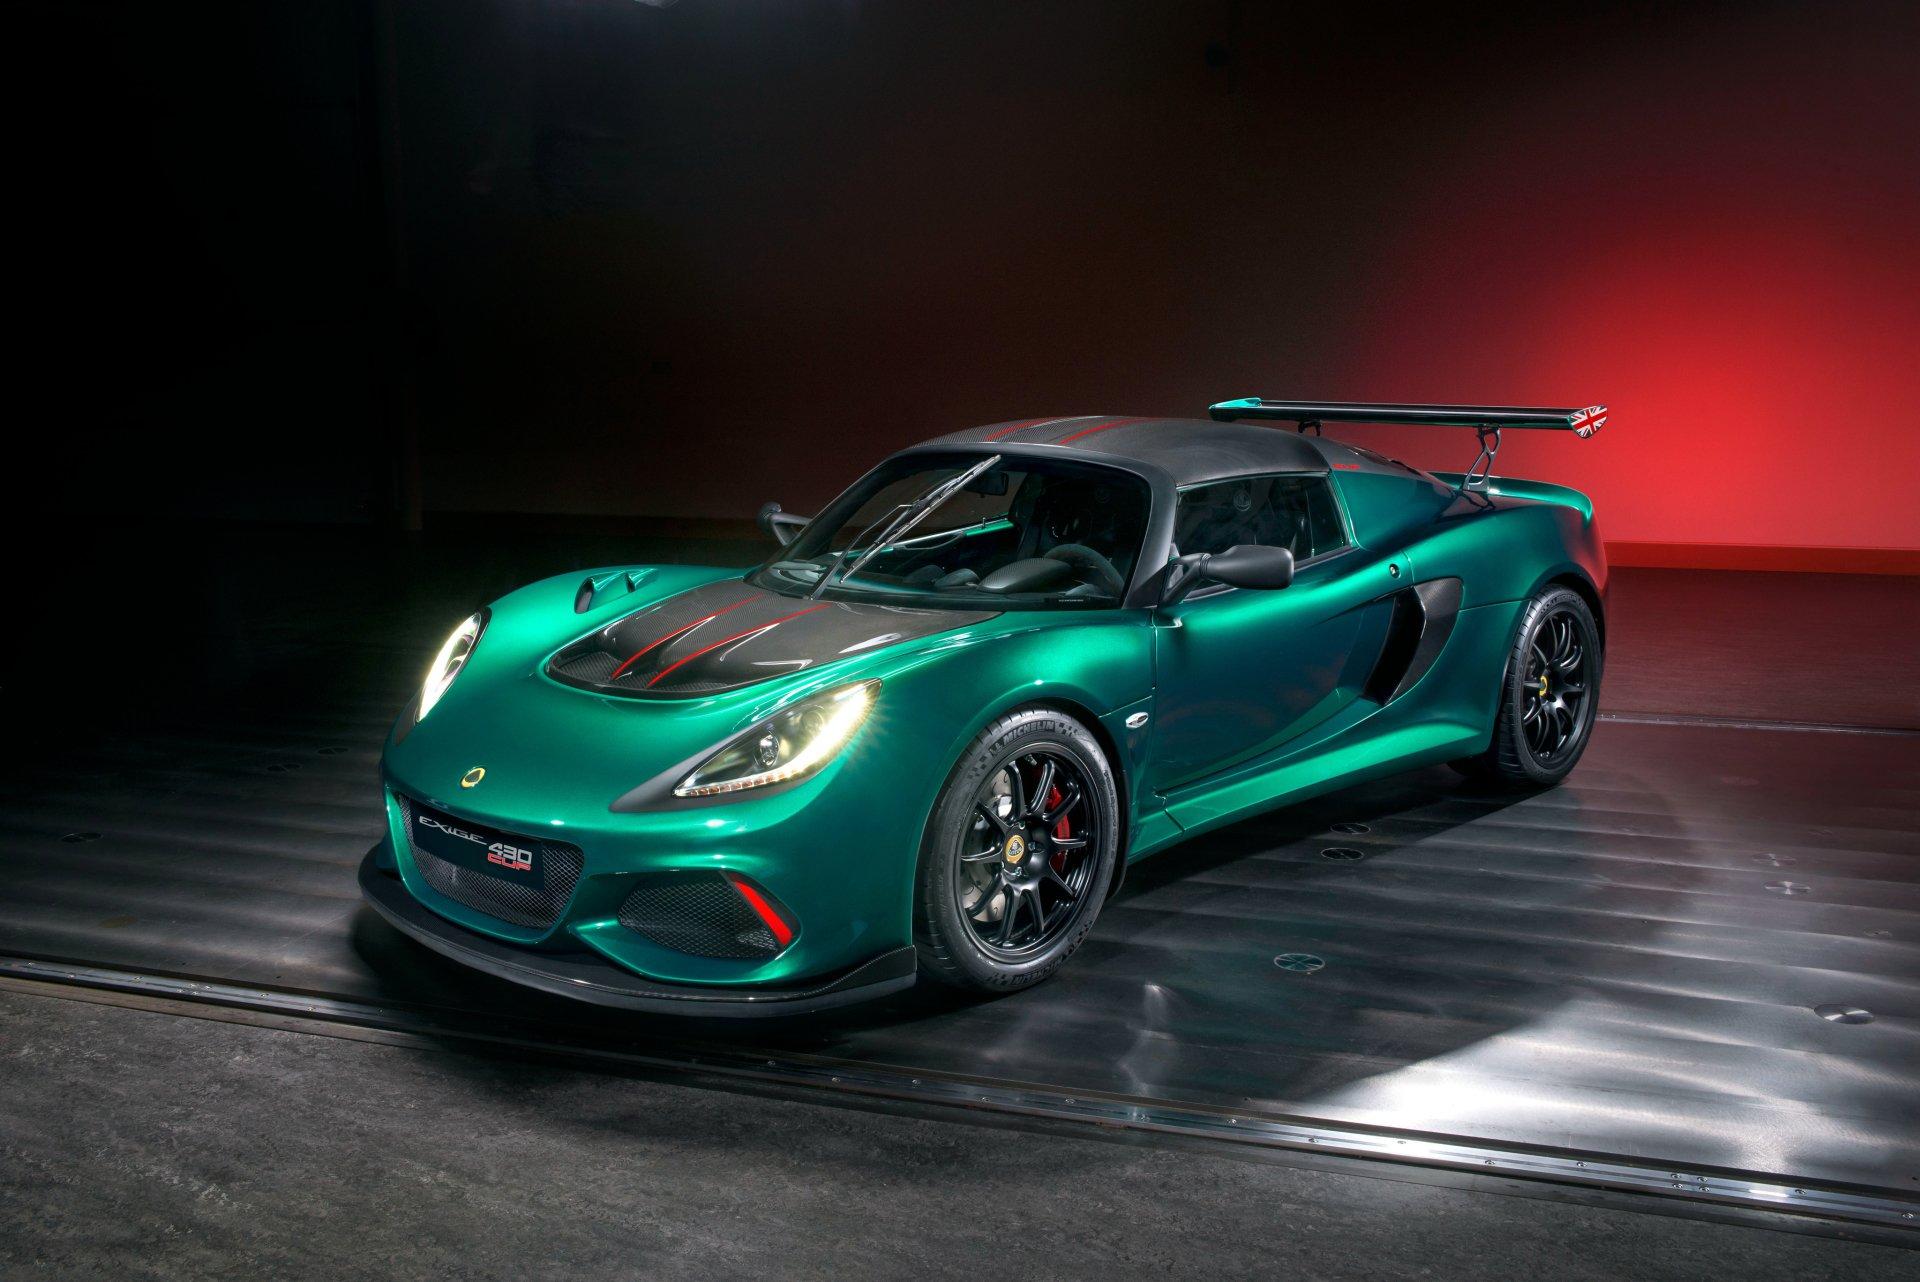 Pojazdy - Lotus Exige  Sport Car Supercar Green Car Samochód Lotus Exige Cup 430 Tapeta